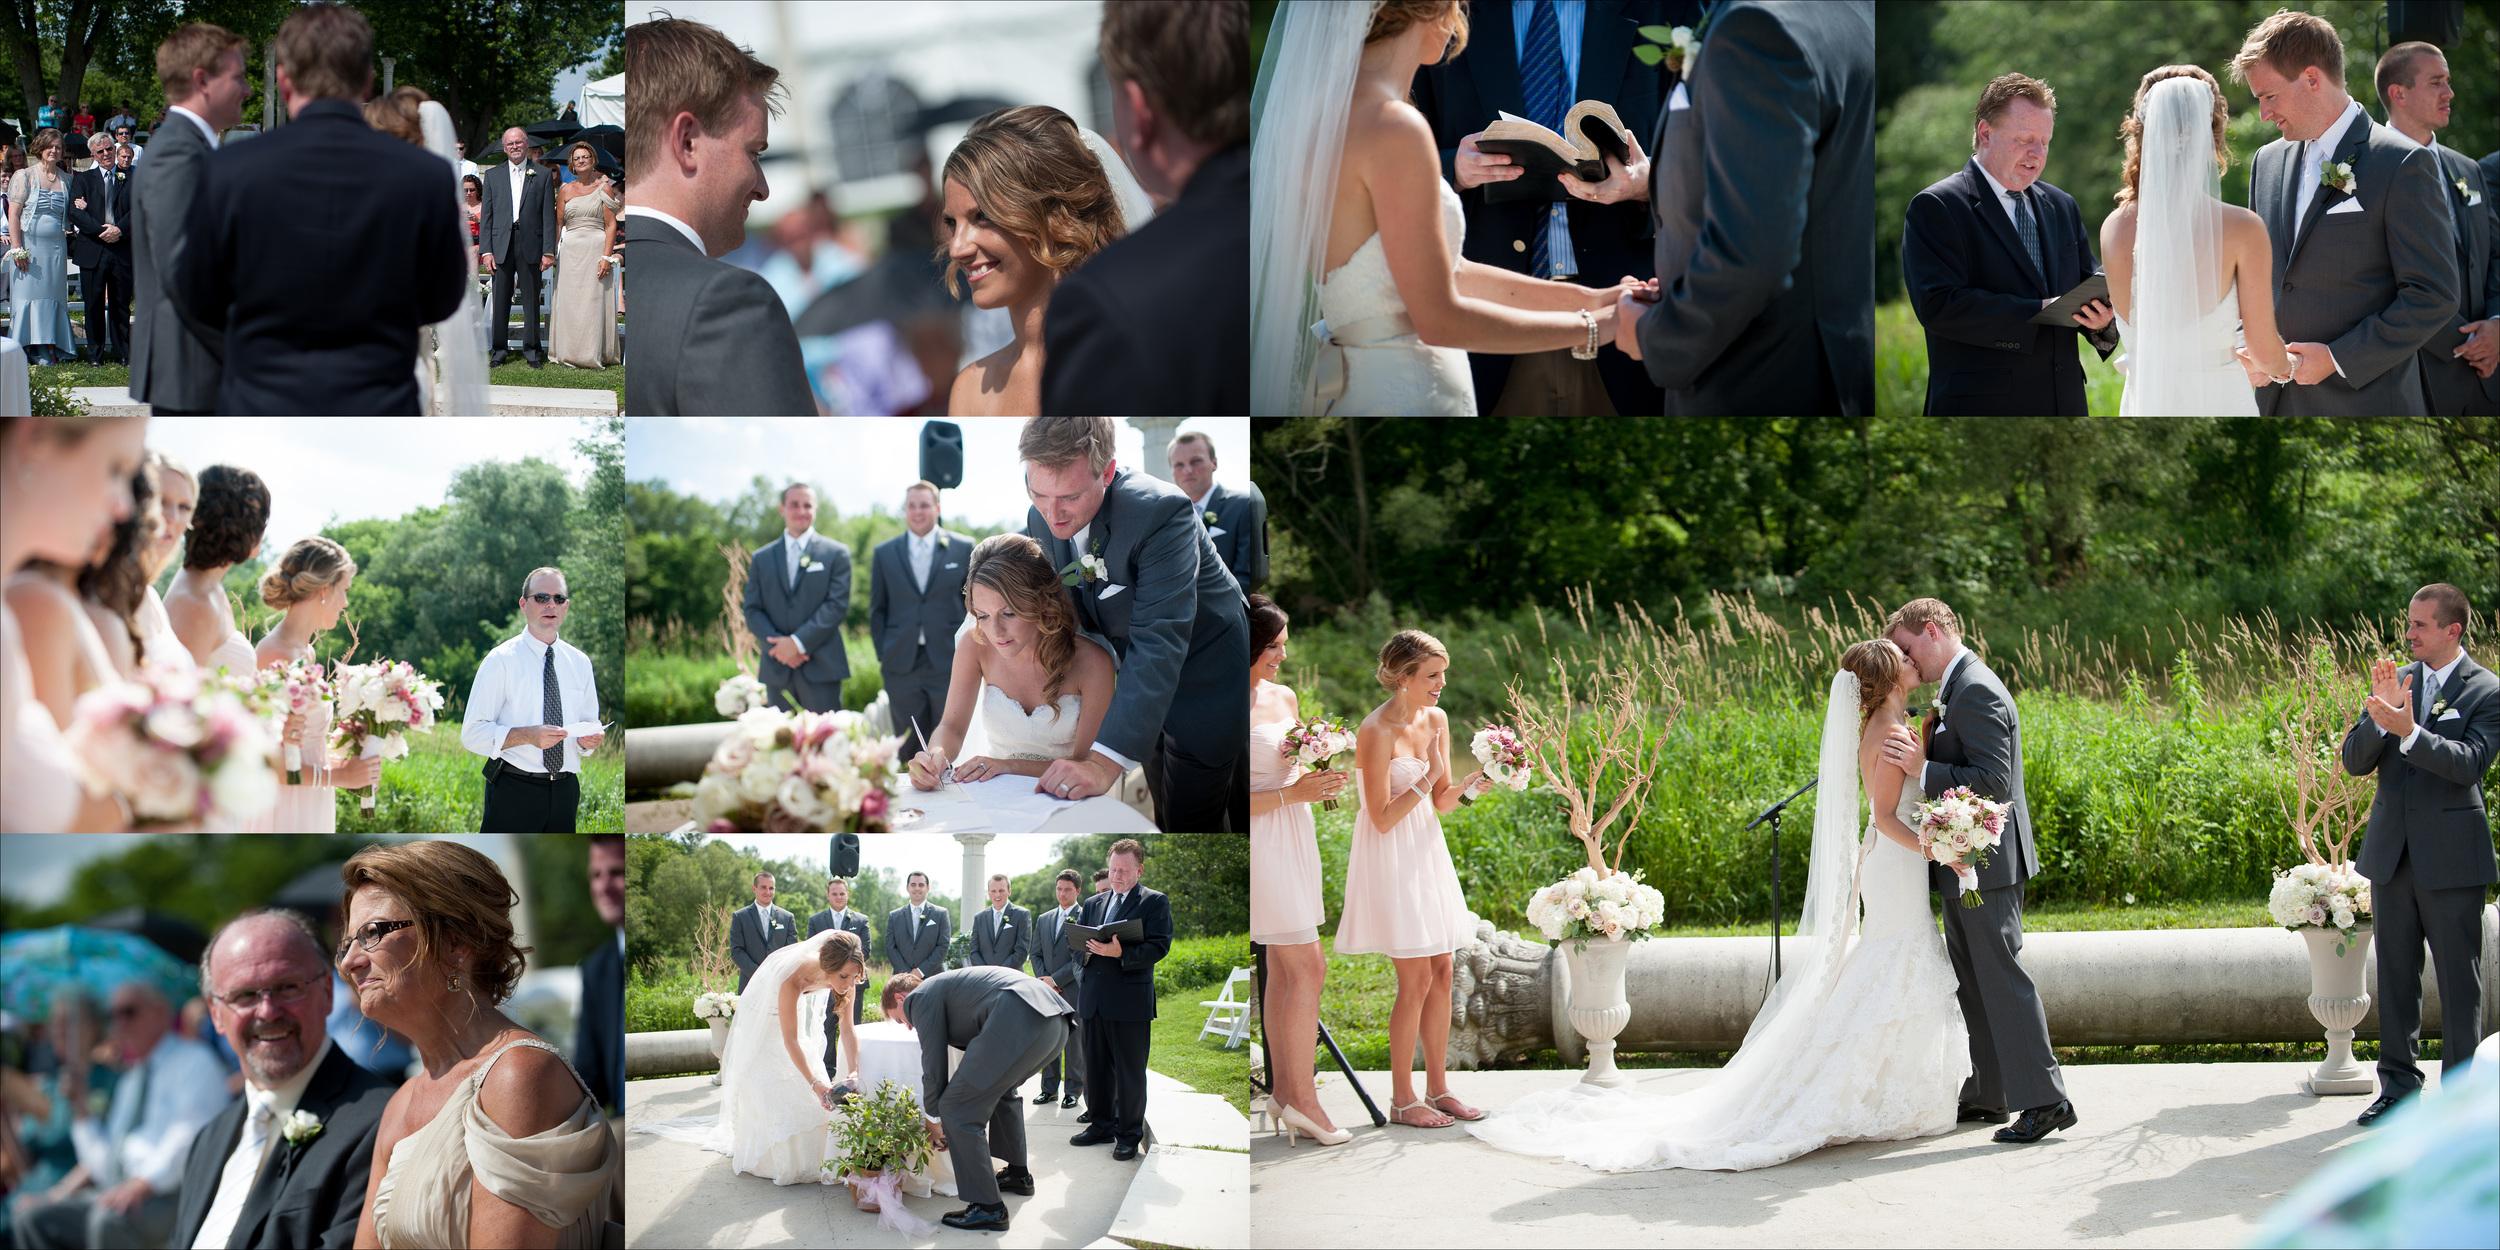 nith-ridge-wedding-album10.jpg